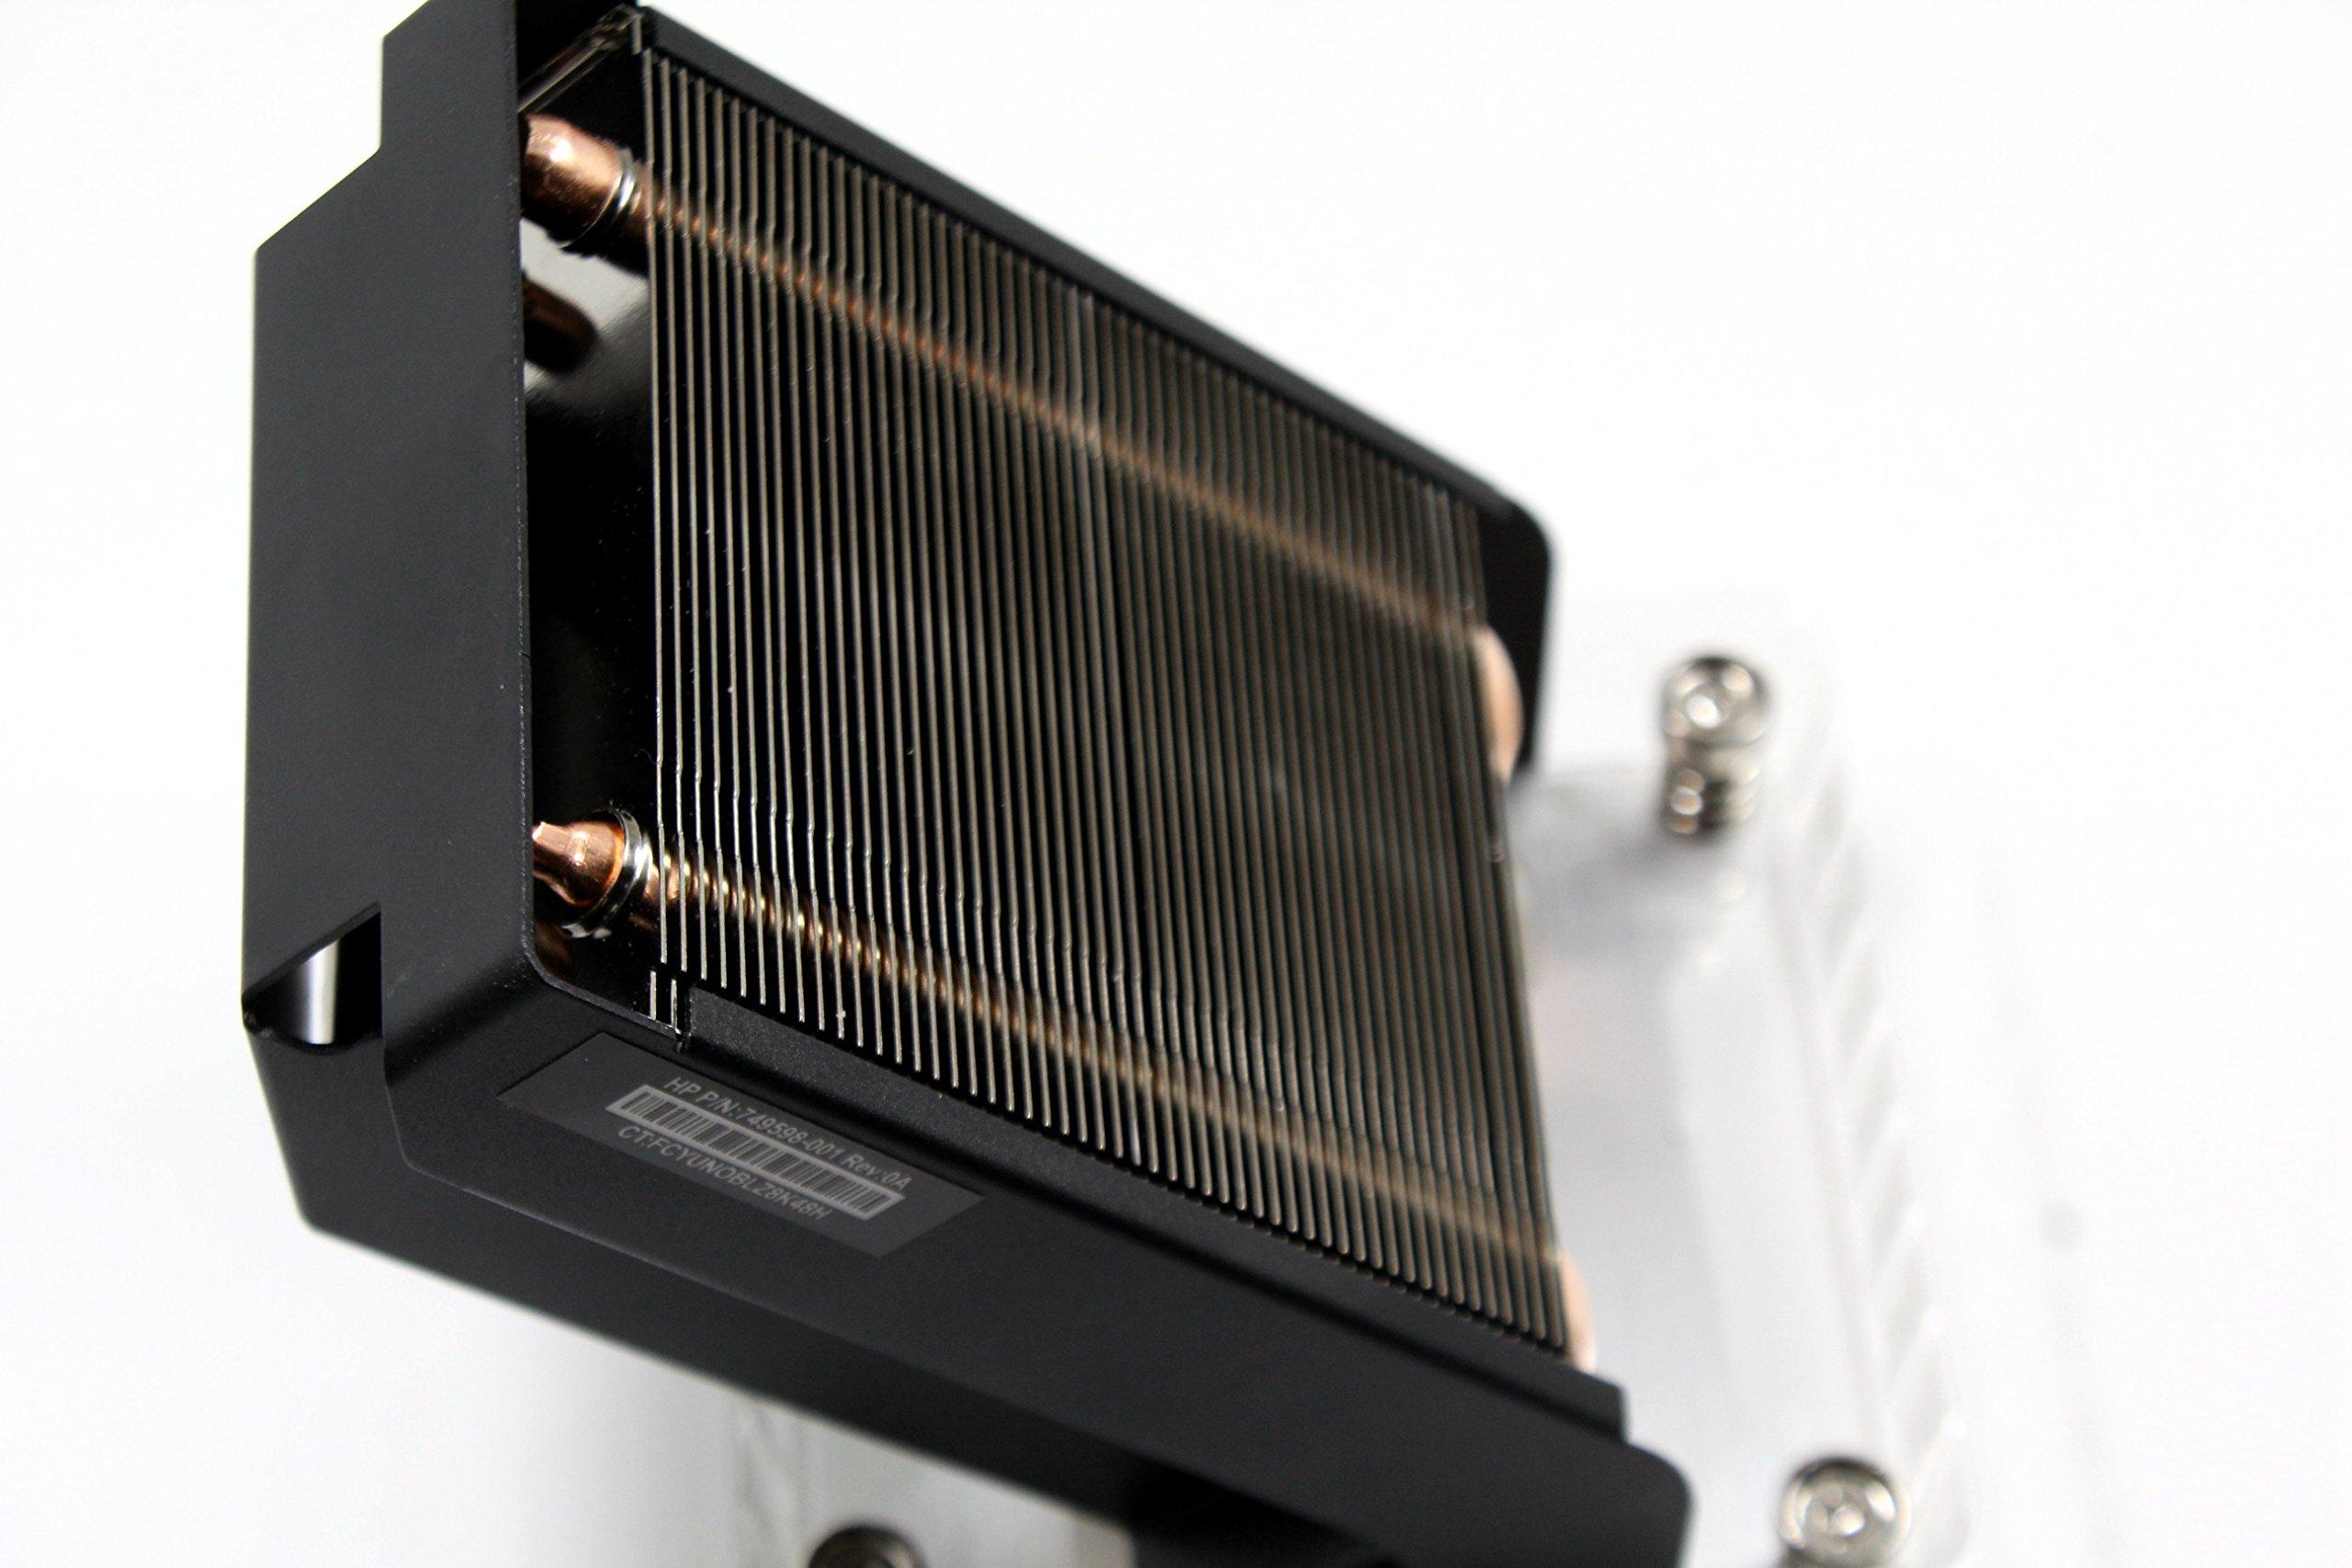 BestParts New Heatsink for HP Z840 Workstation 749598-001 782506-001 Suit for Z820 635868-001 by BestPartsCom